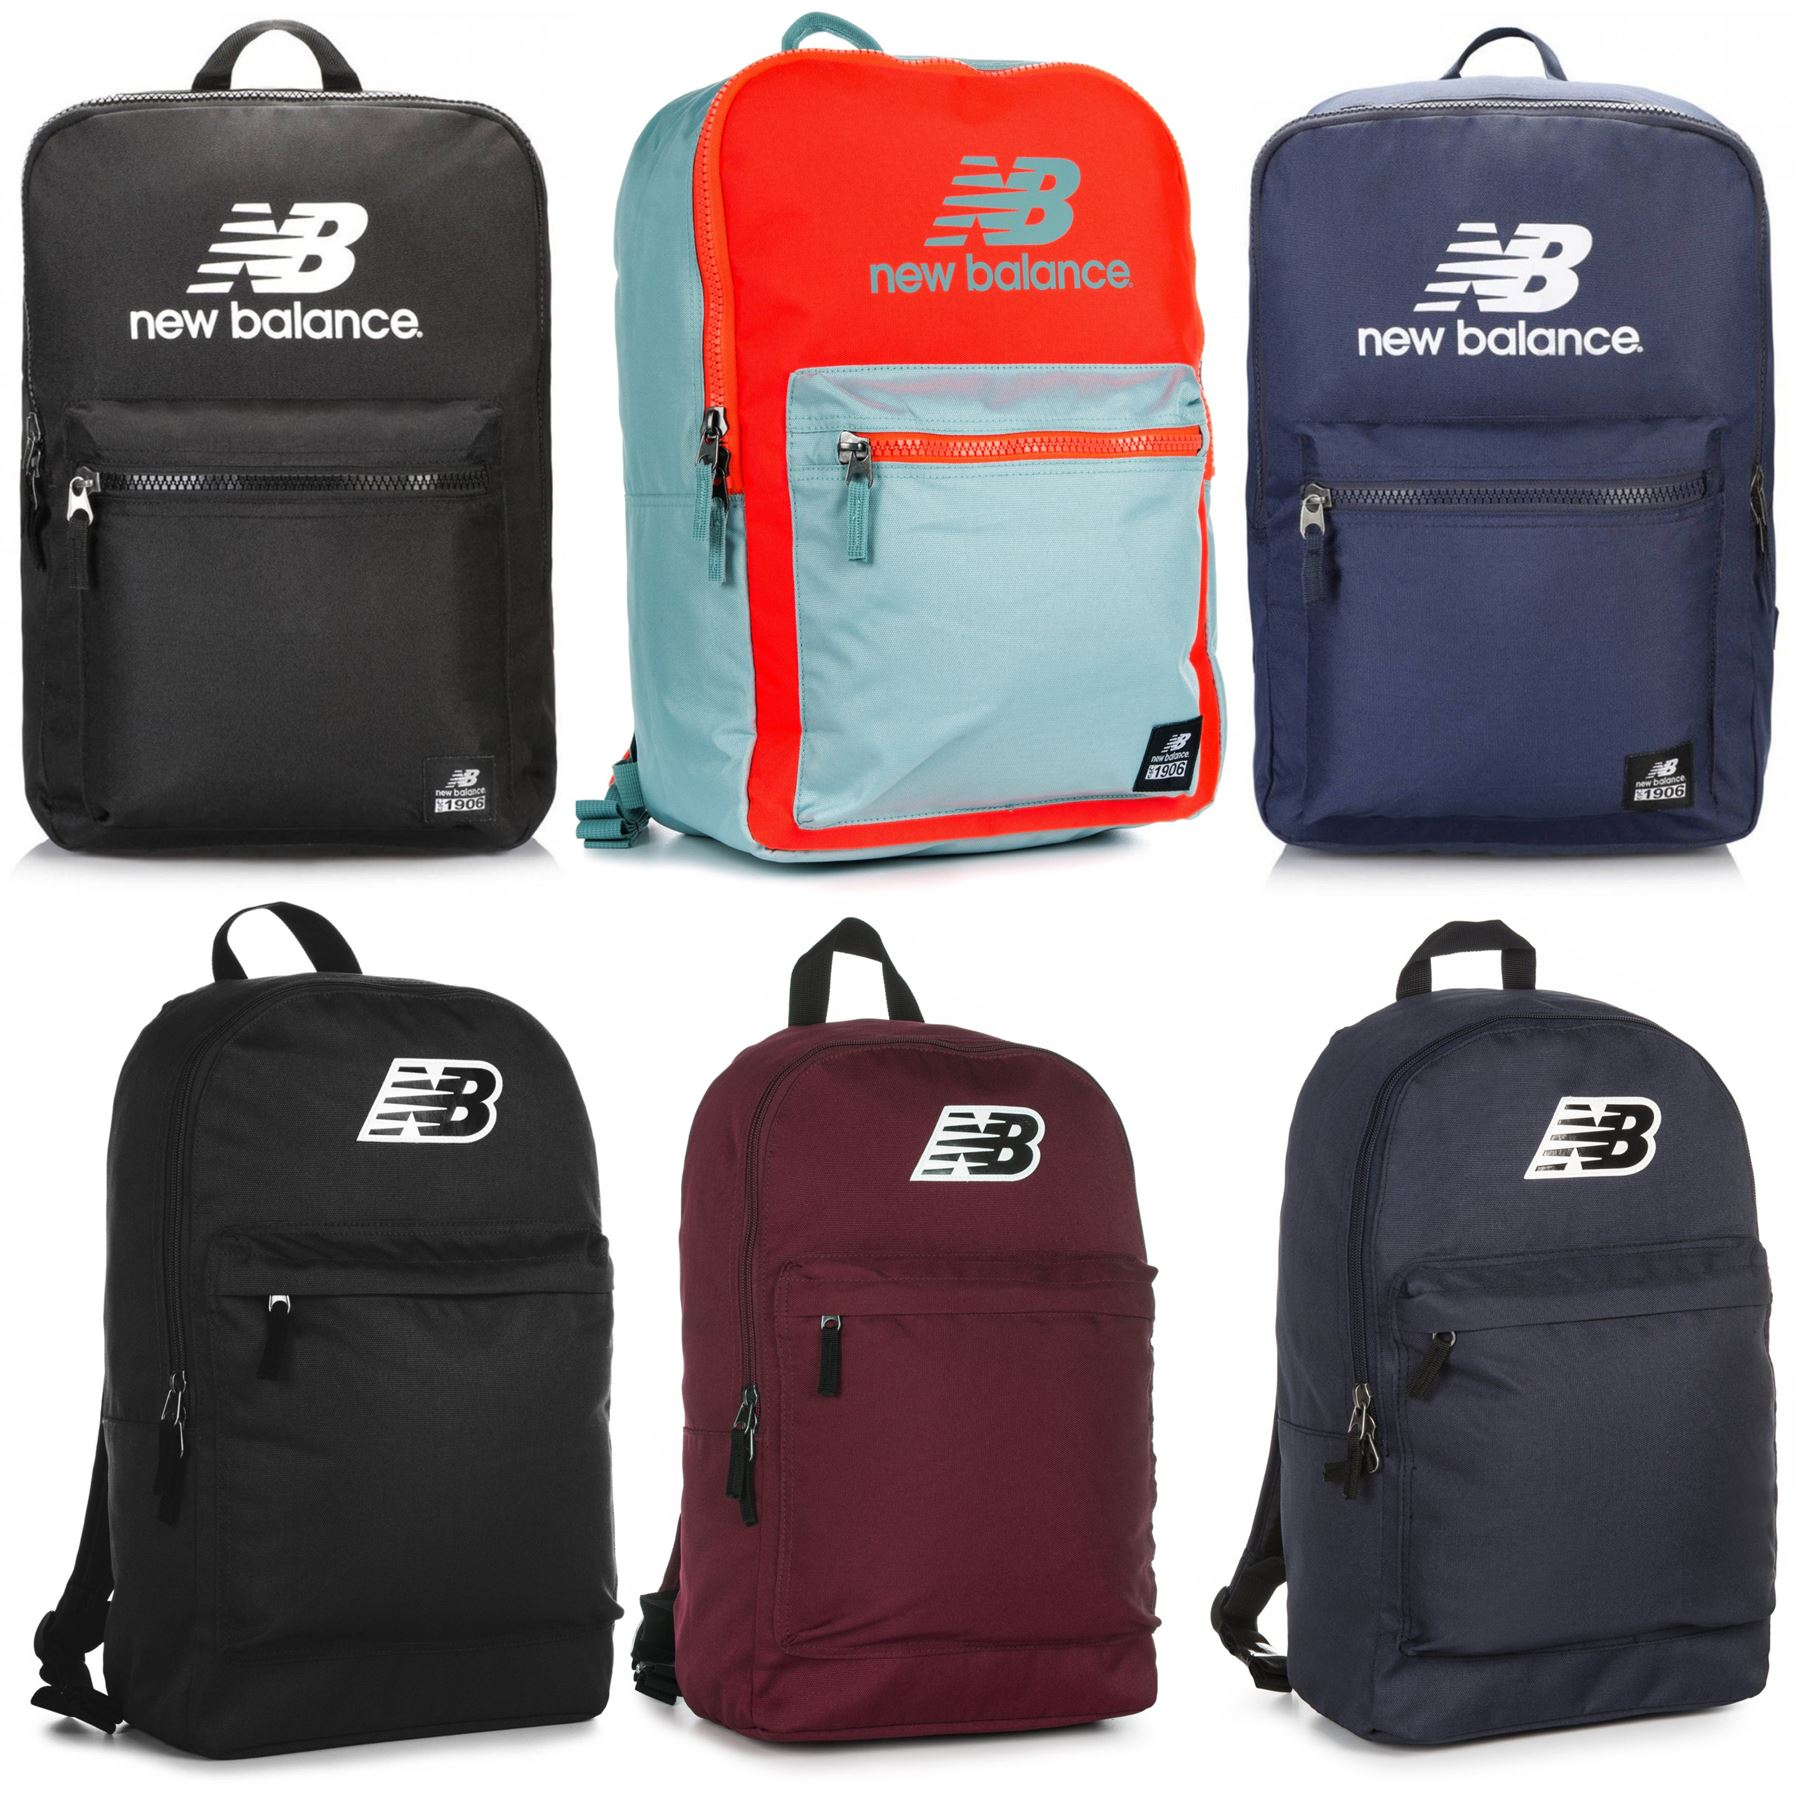 0b810016f9 New Balance Backpack Assorted Rucksack Bags - Black, Blue, Orange | eBay